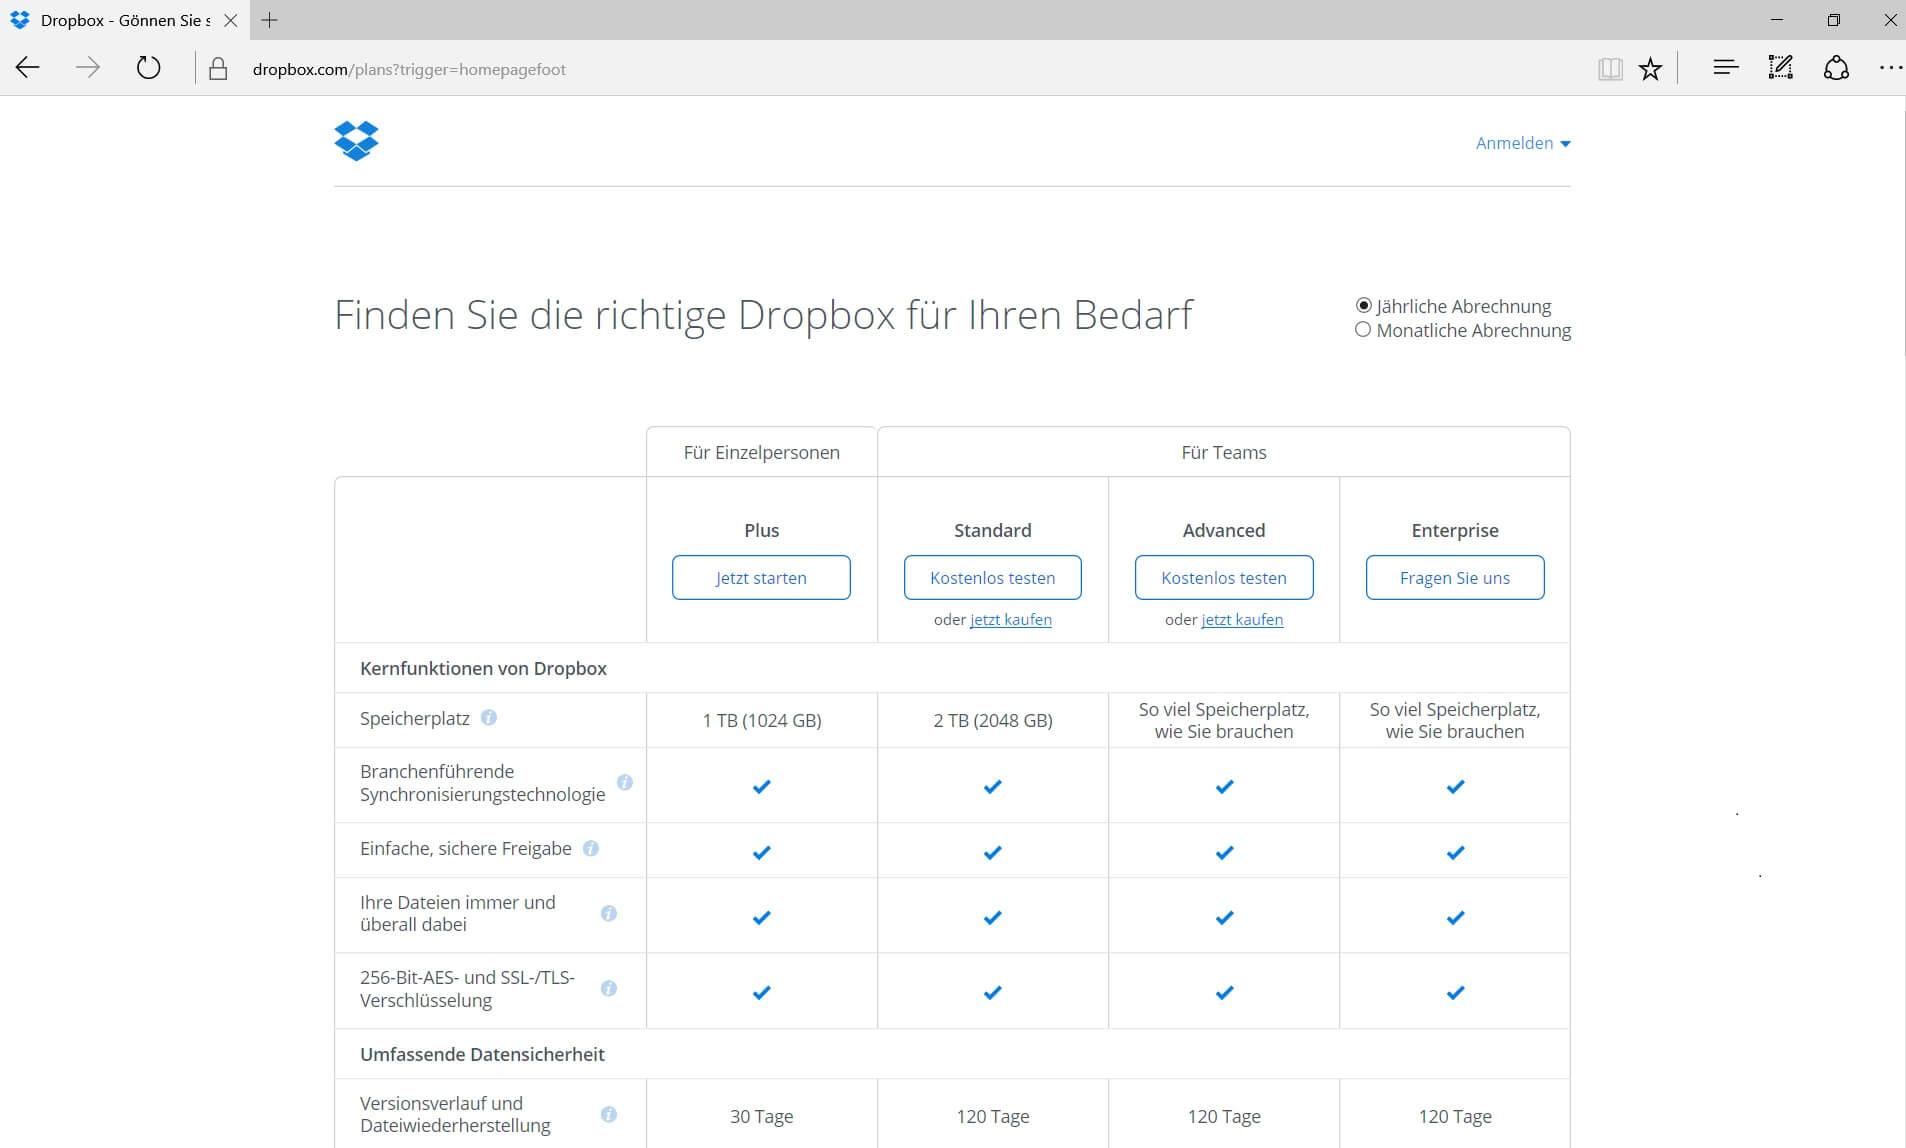 Dropbox gutes Preis- Leistungsverhältnis